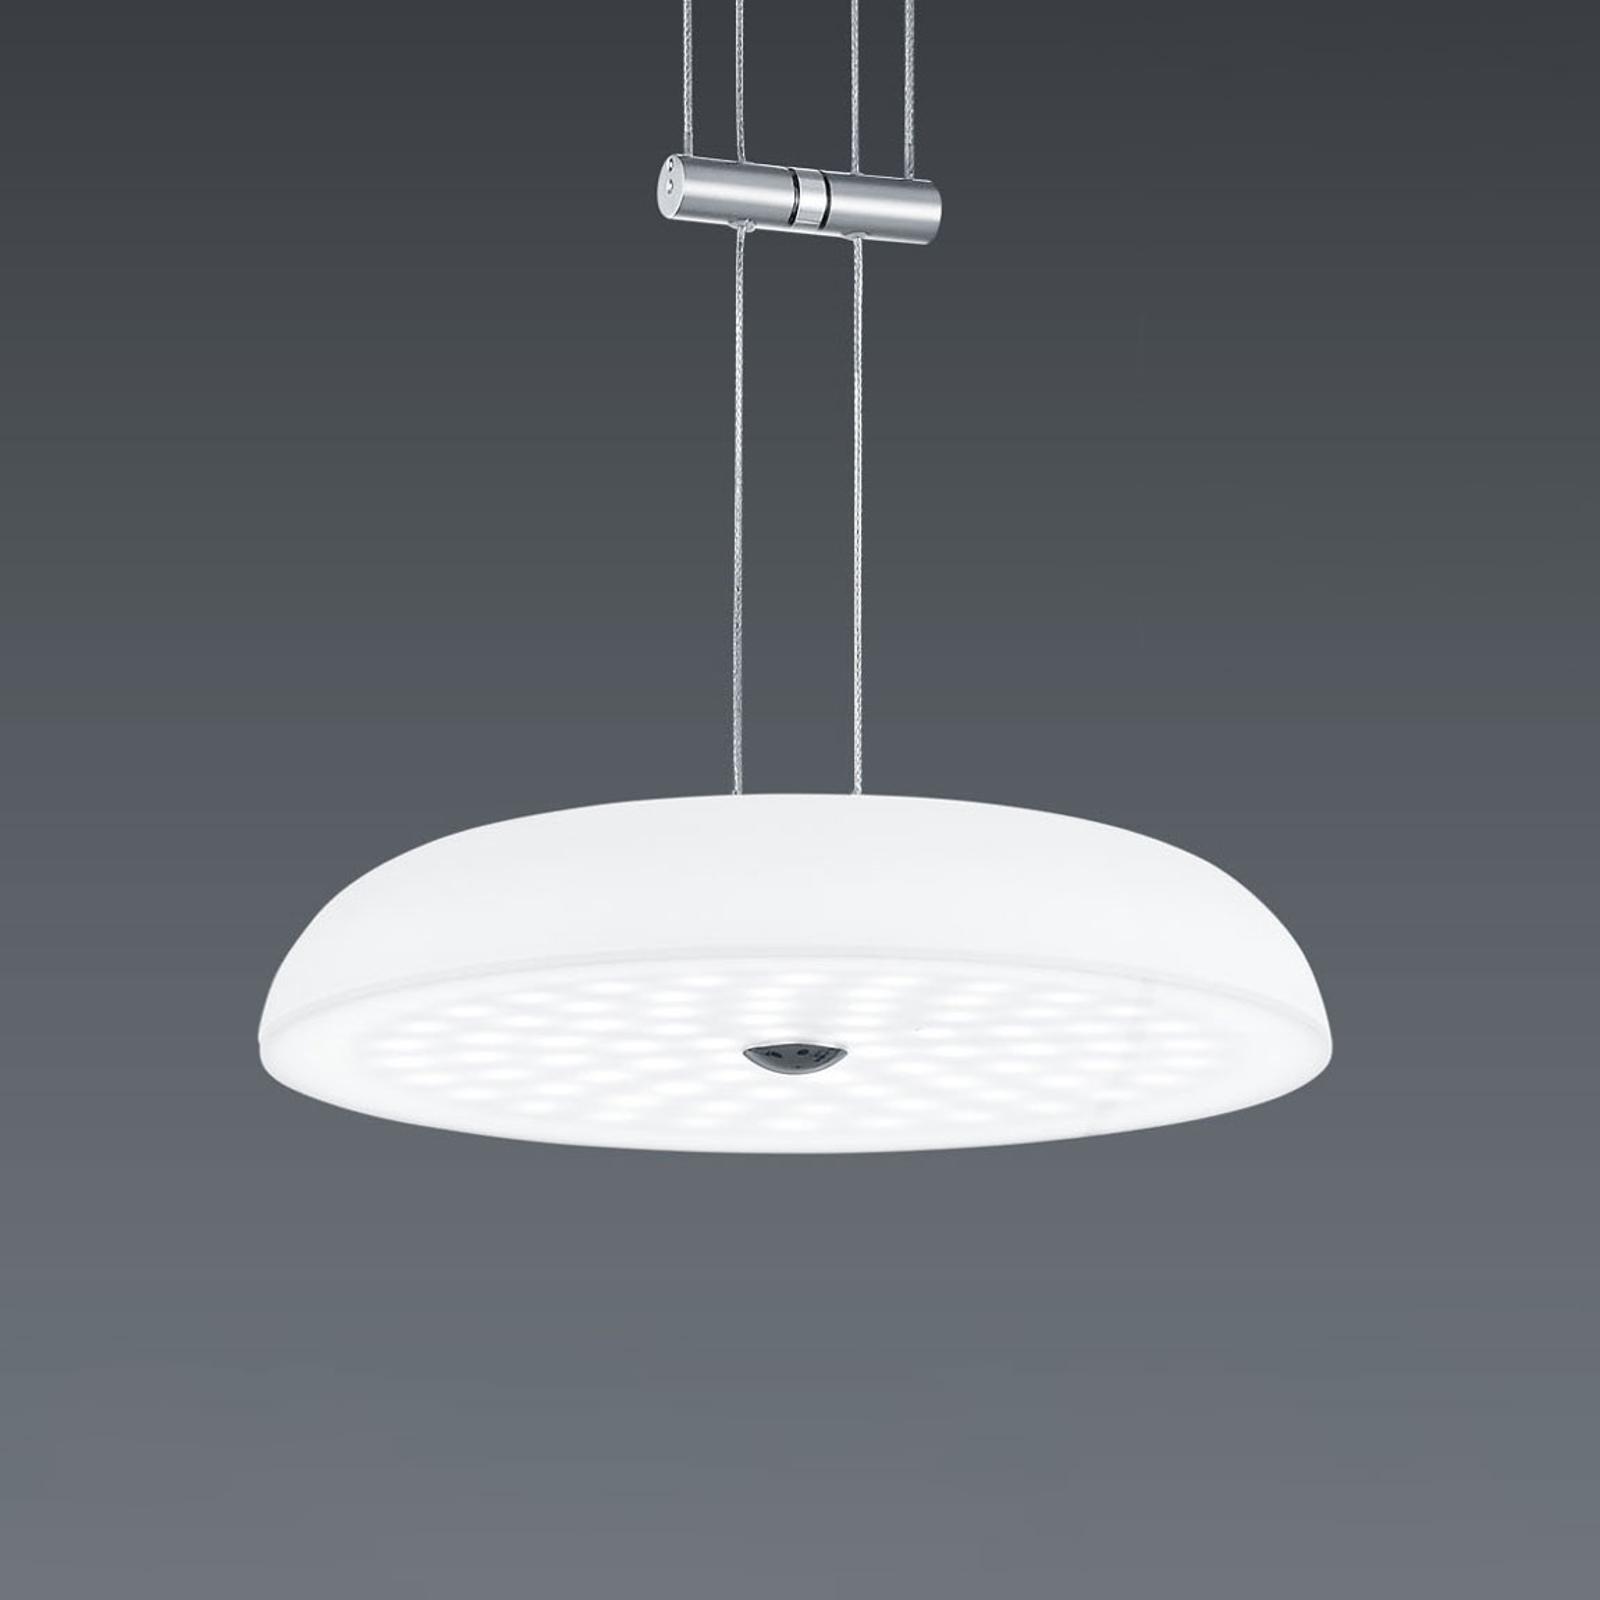 BANKAMP Vanity lampa wisząca 1pkt nikiel Ø 25 cm